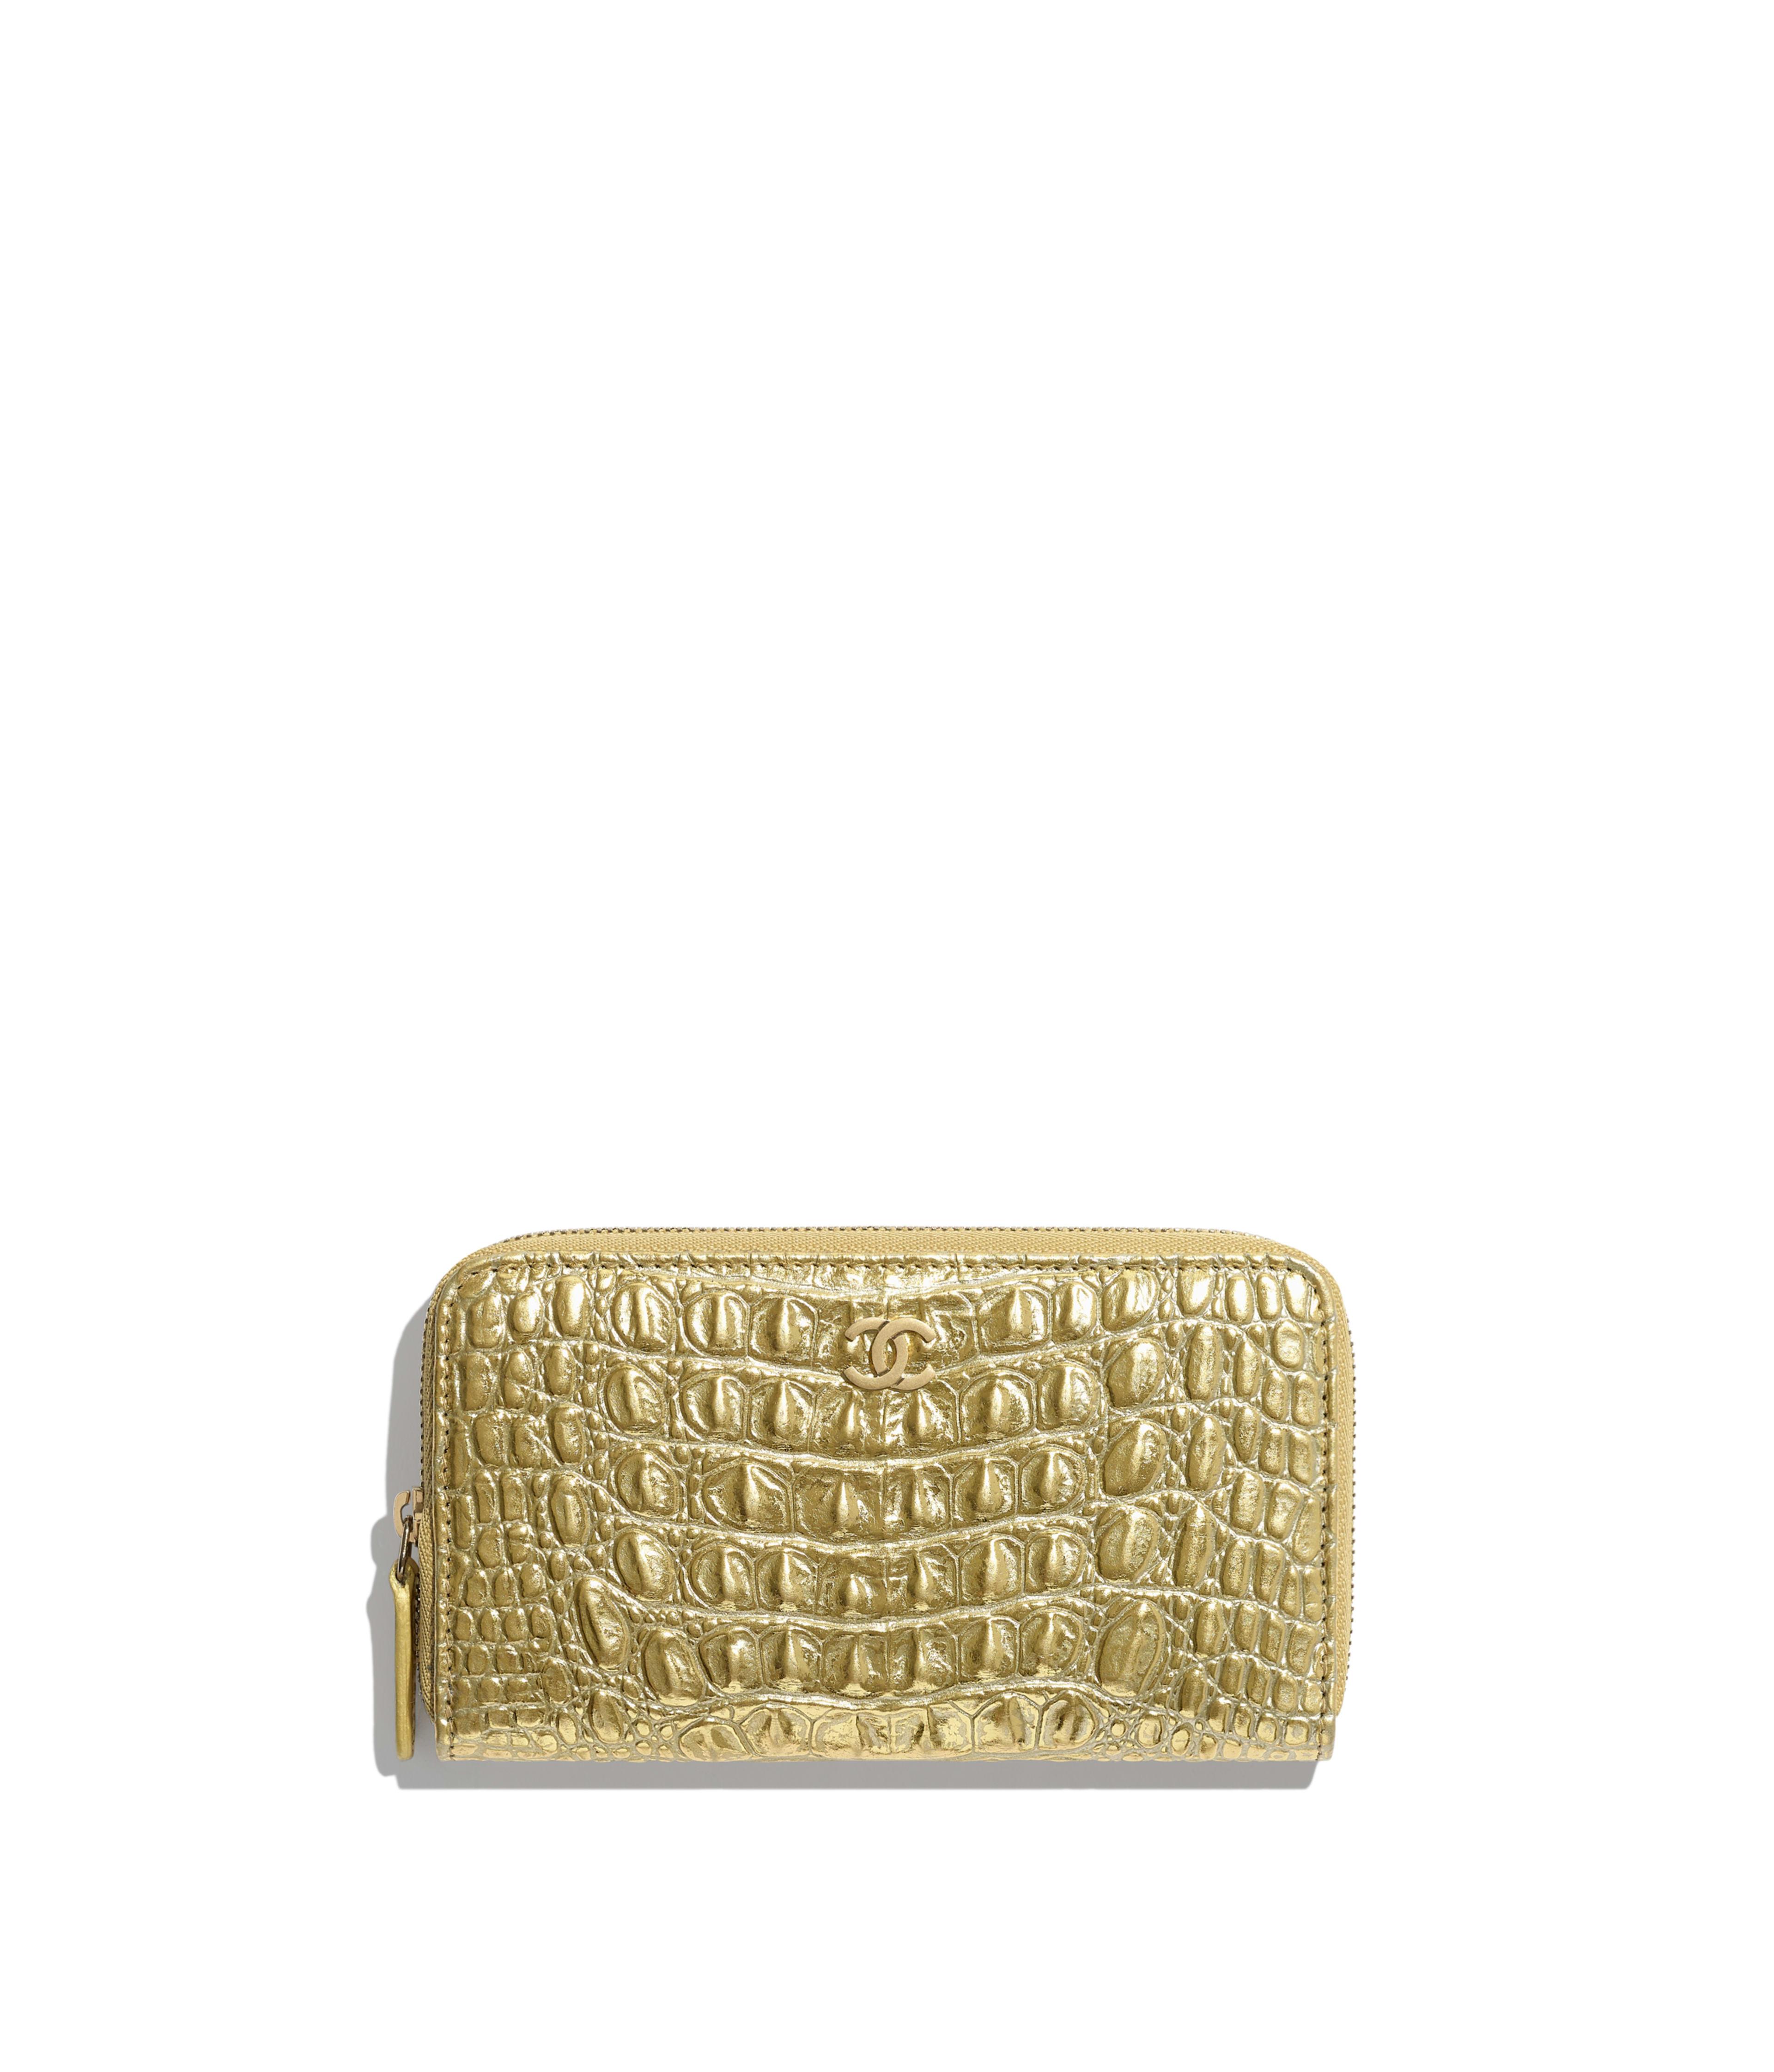 3791c920966d88 Classic Zipped Wallet Metallic Crocodile Embossed Calfskin & Gold Metal,  Gold Ref. A80481B00798N4752